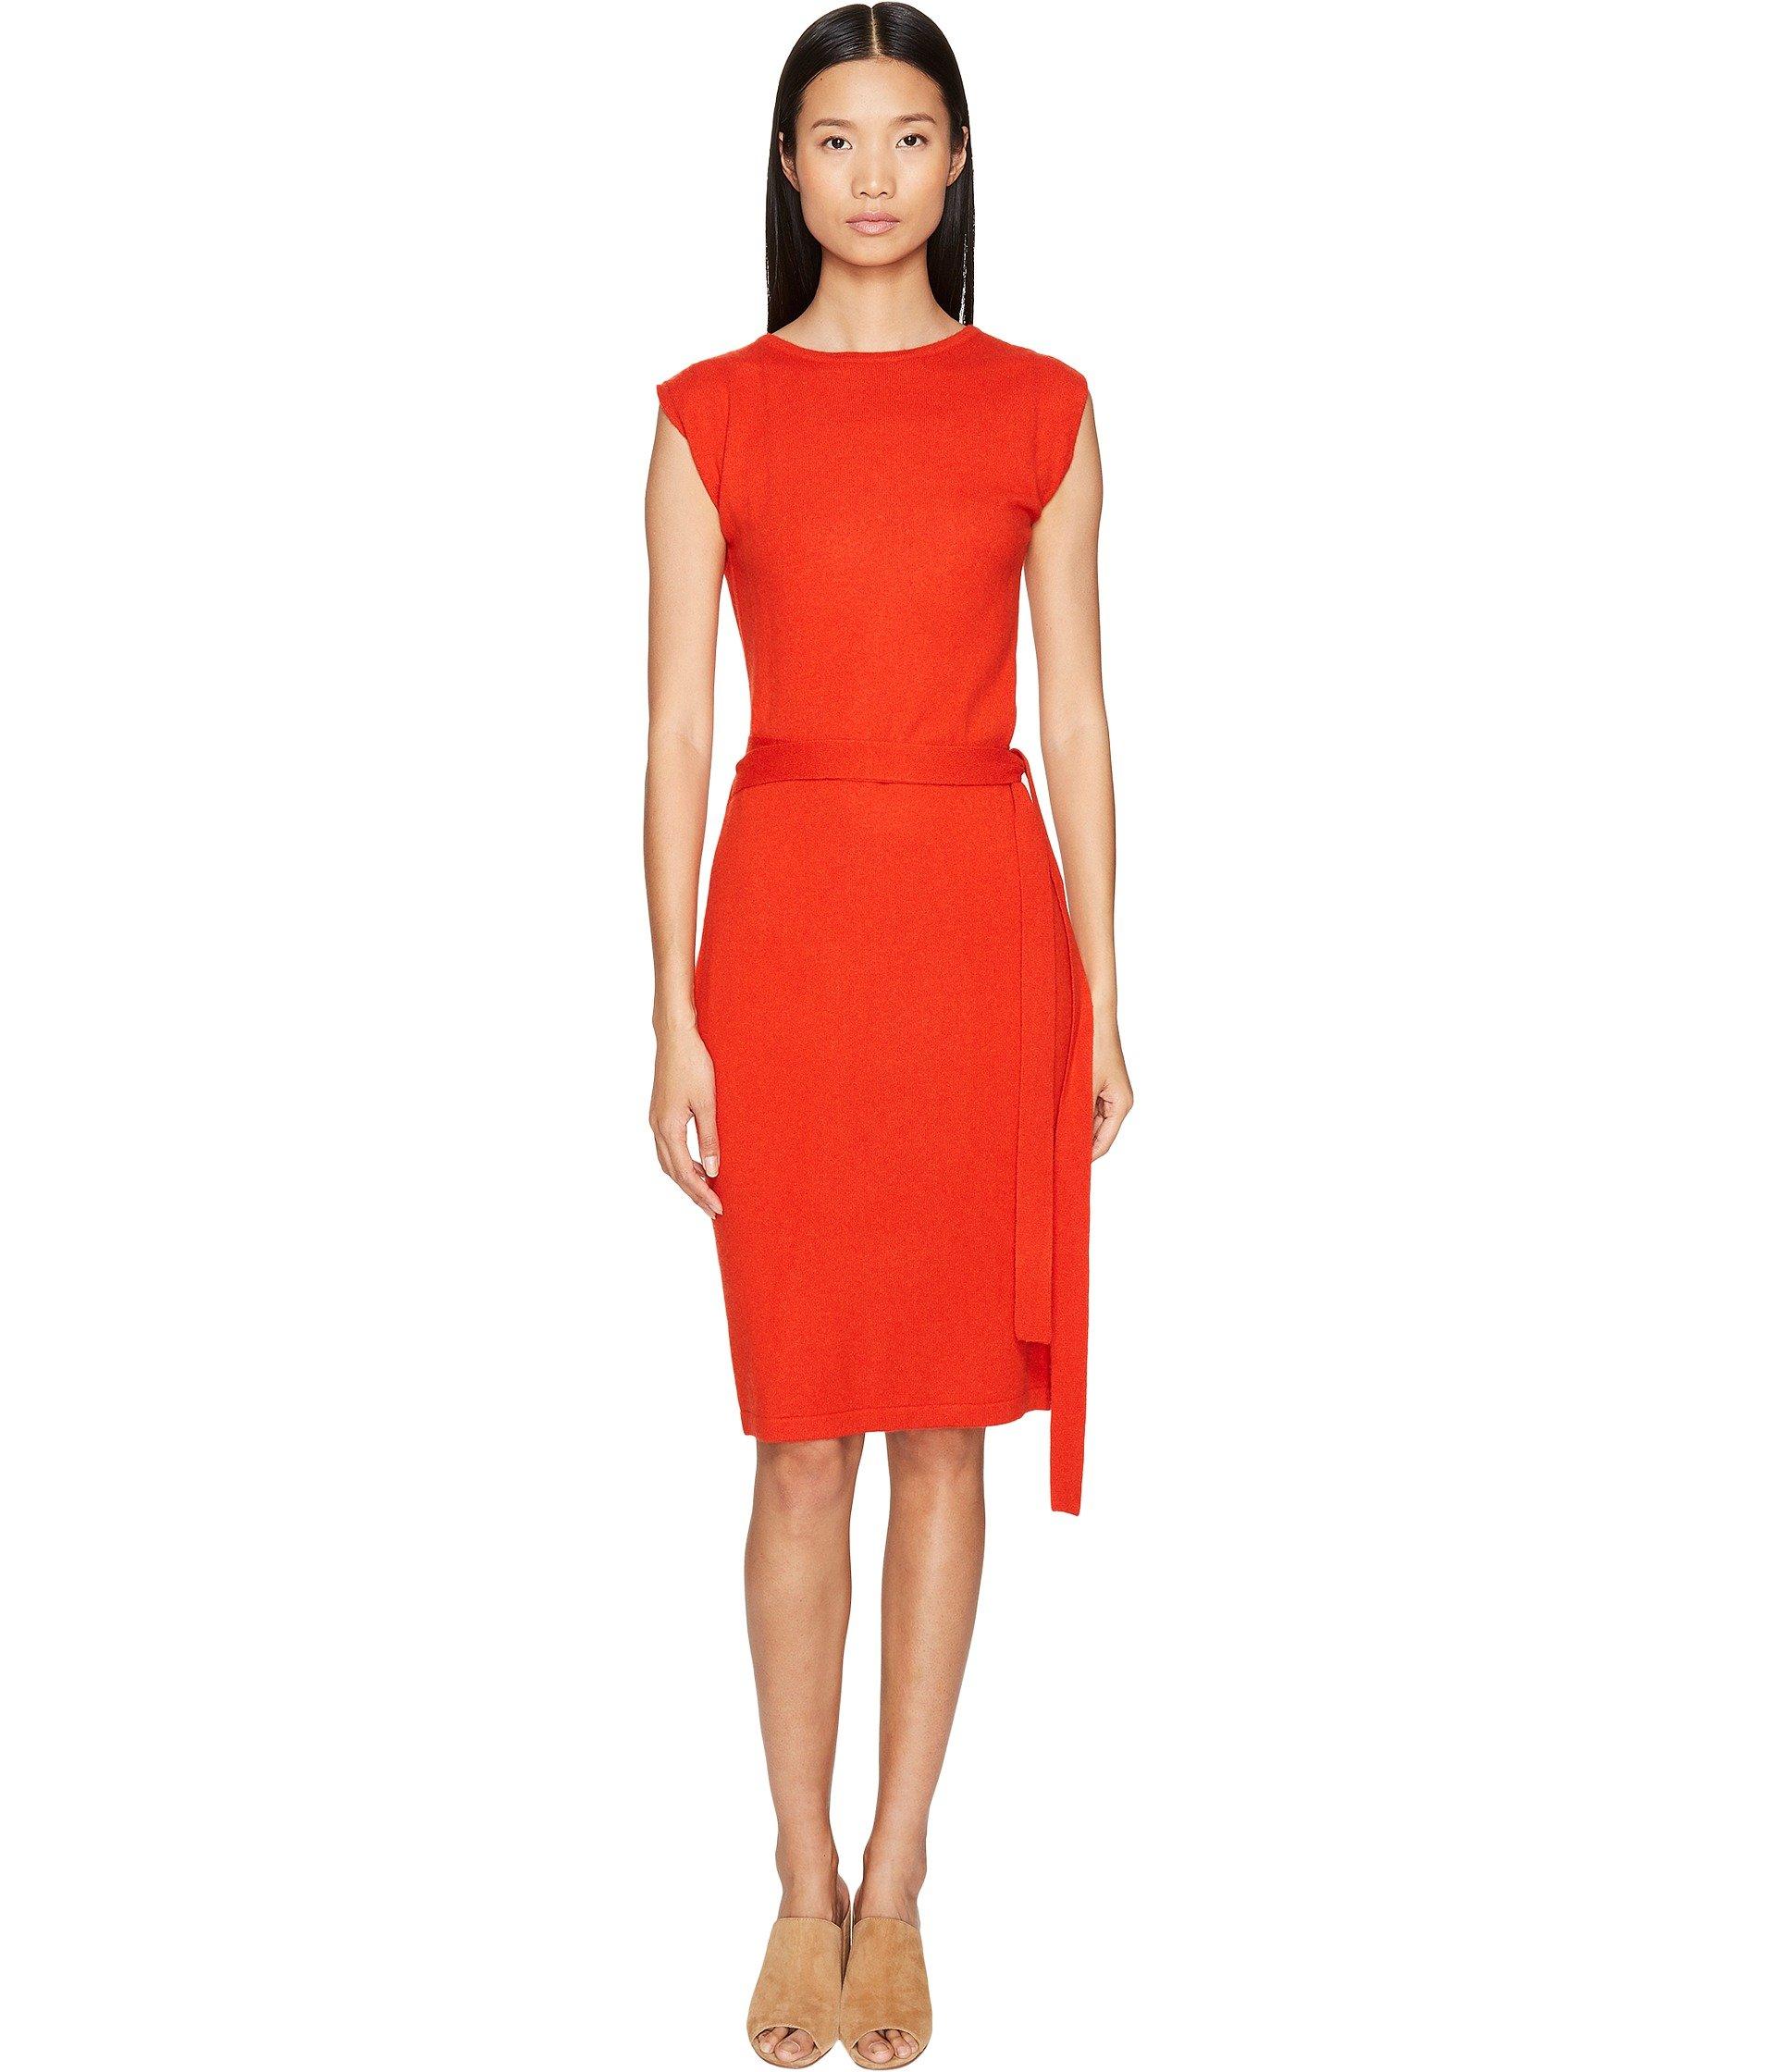 Colette Wrapped Envelope Dress, Poppy Red